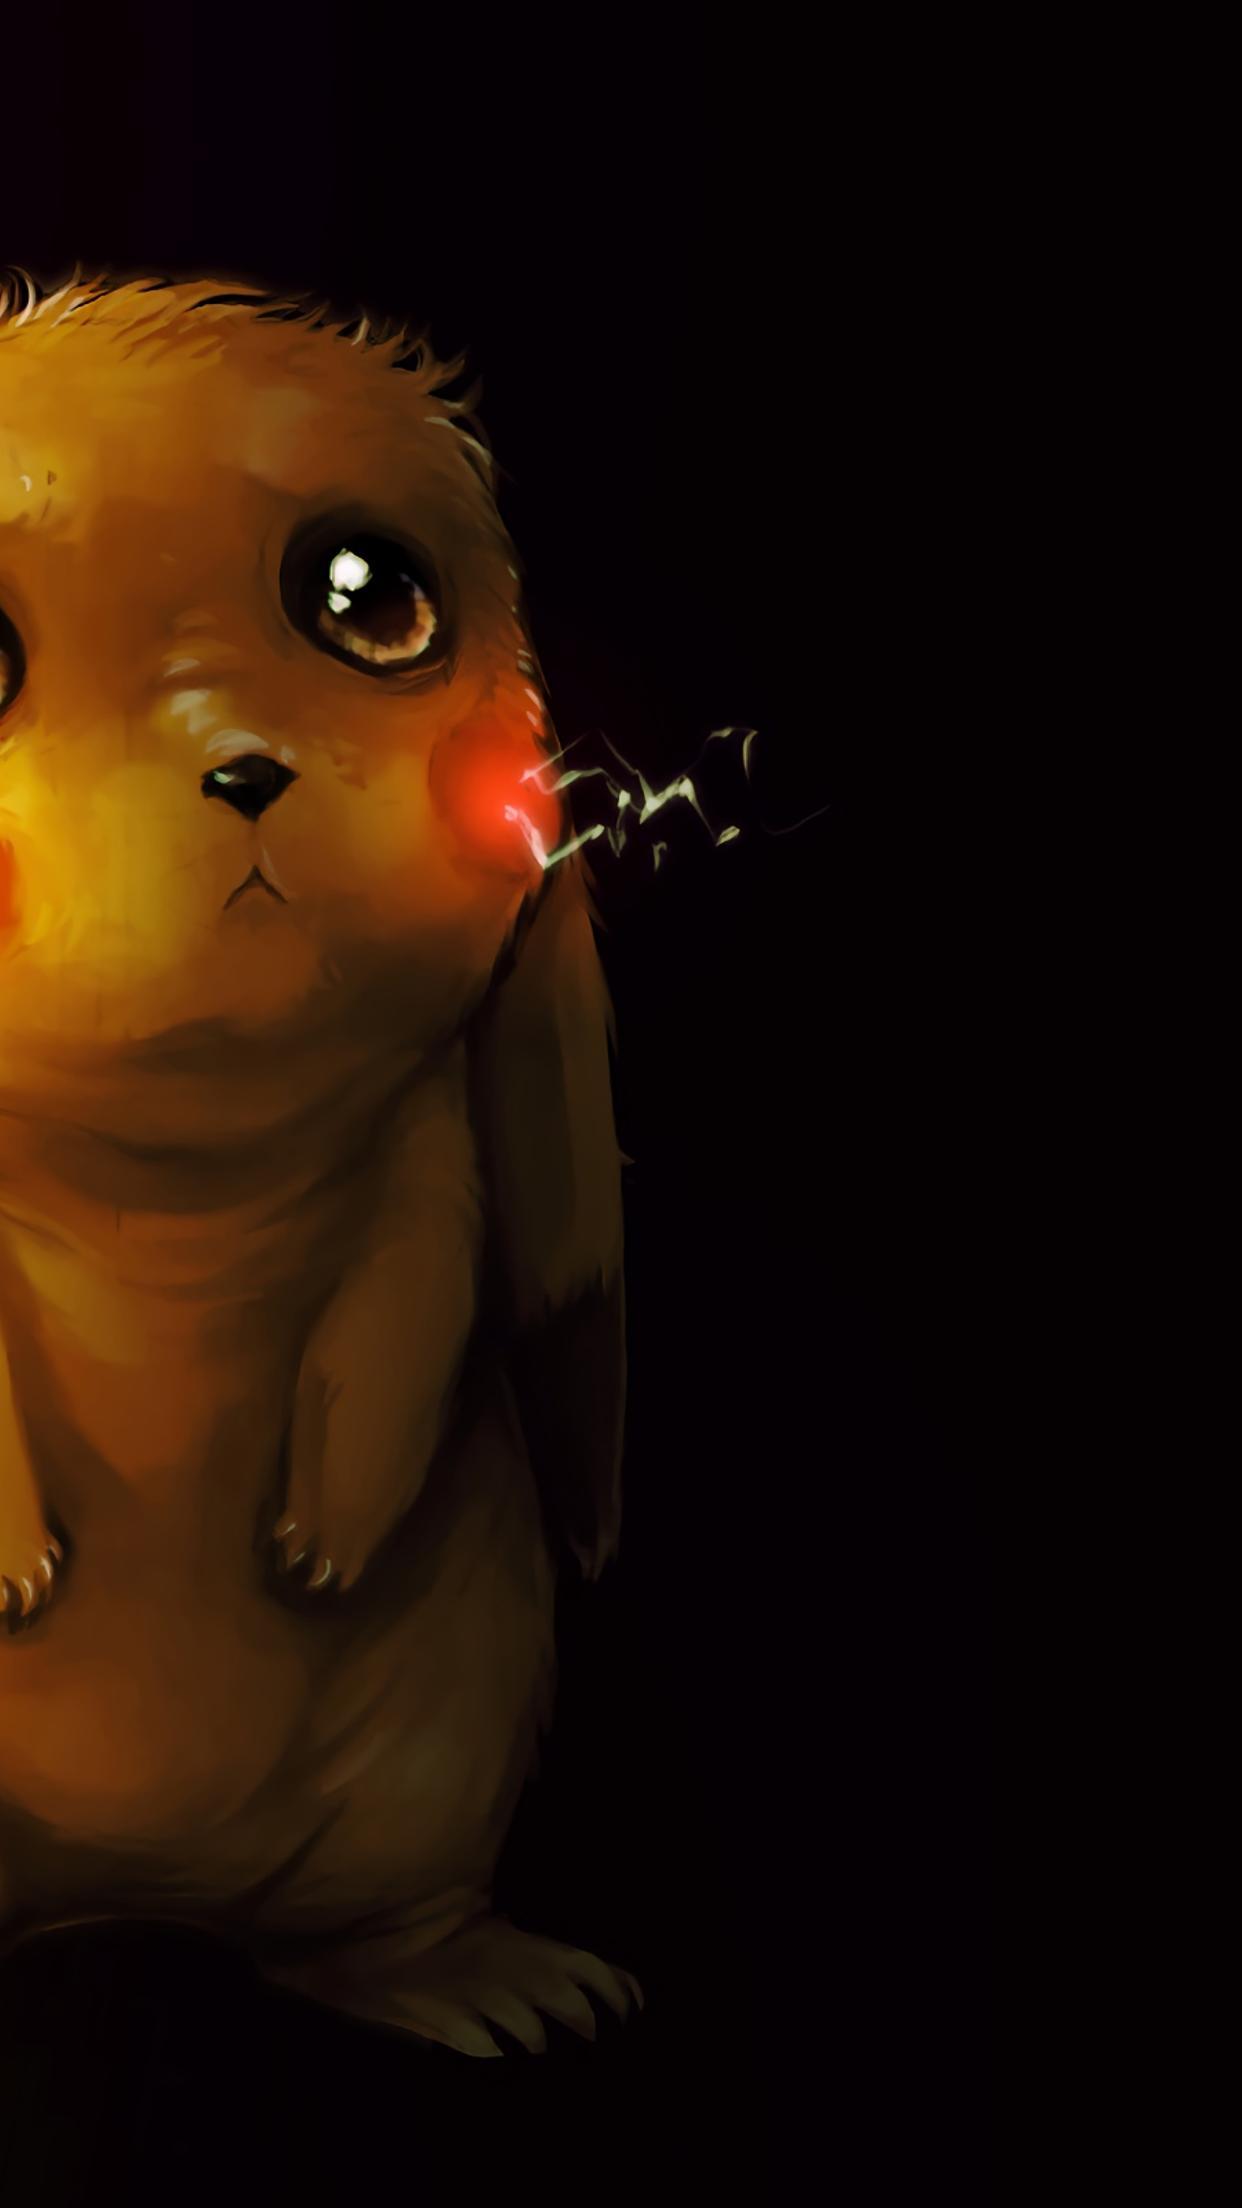 sad pokemon puppy eyes wallpaper download 1242x2208